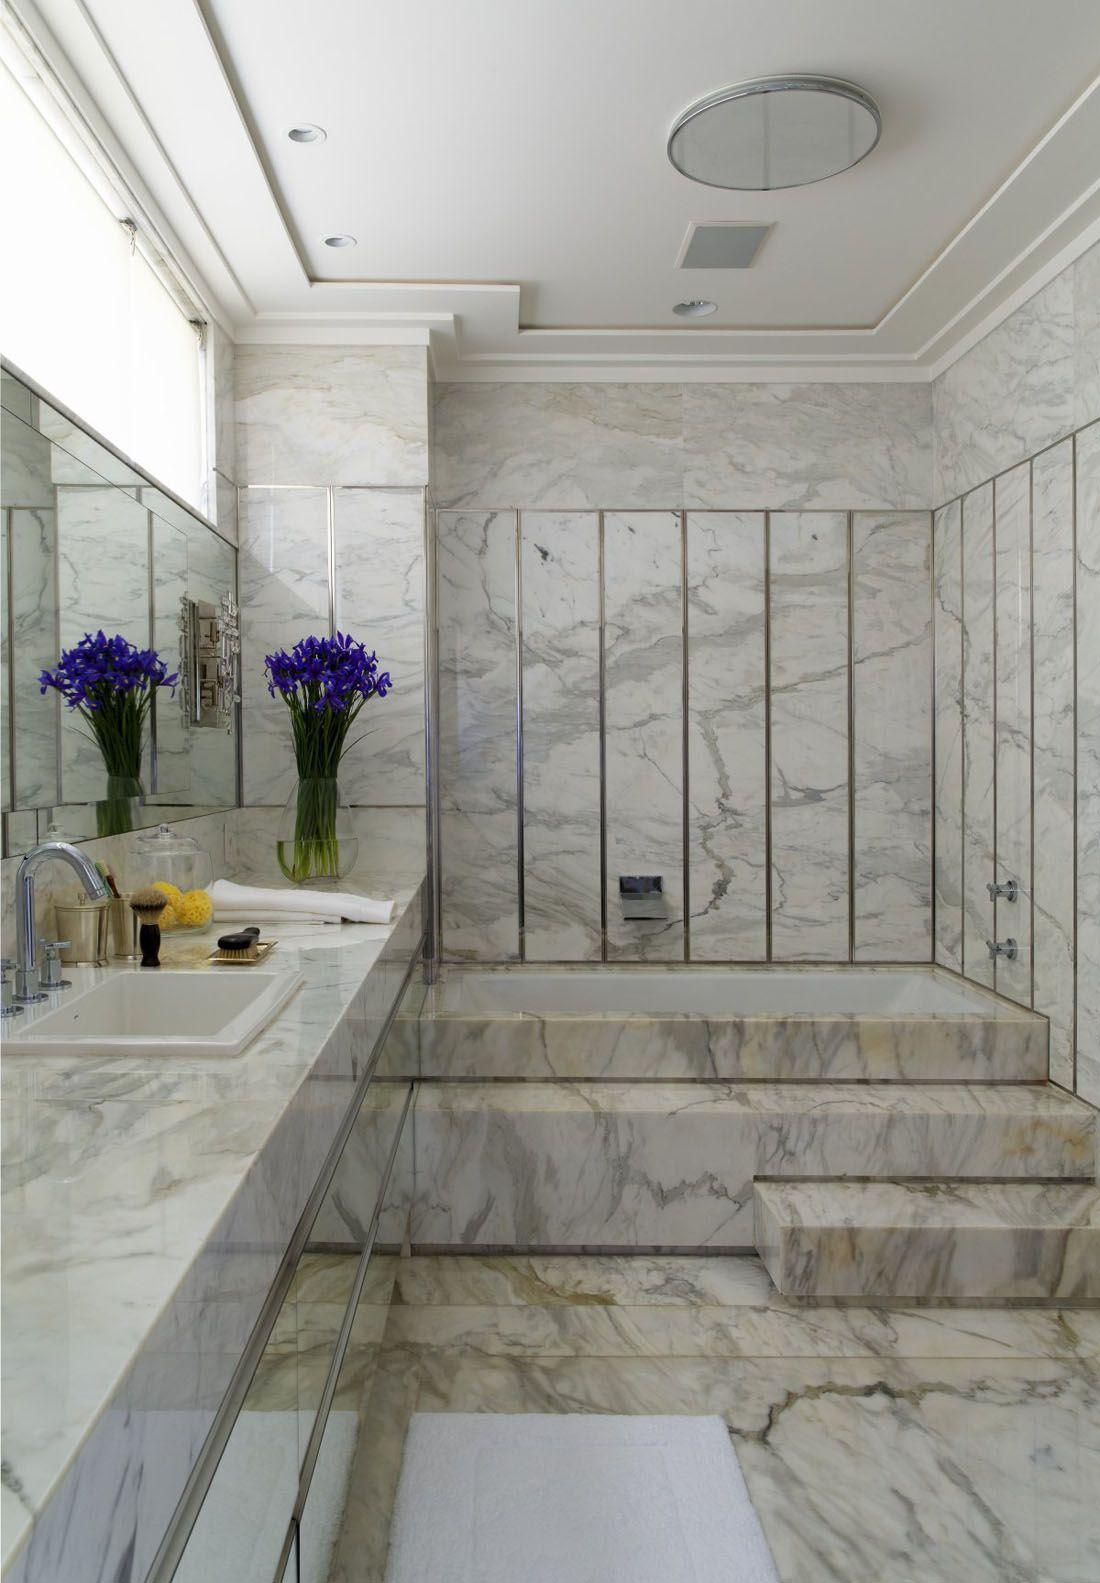 30 Marble Bathroom Design Ideas 22  White Bathrooms  Pinterest Cool Marble Bathroom Designs 2018